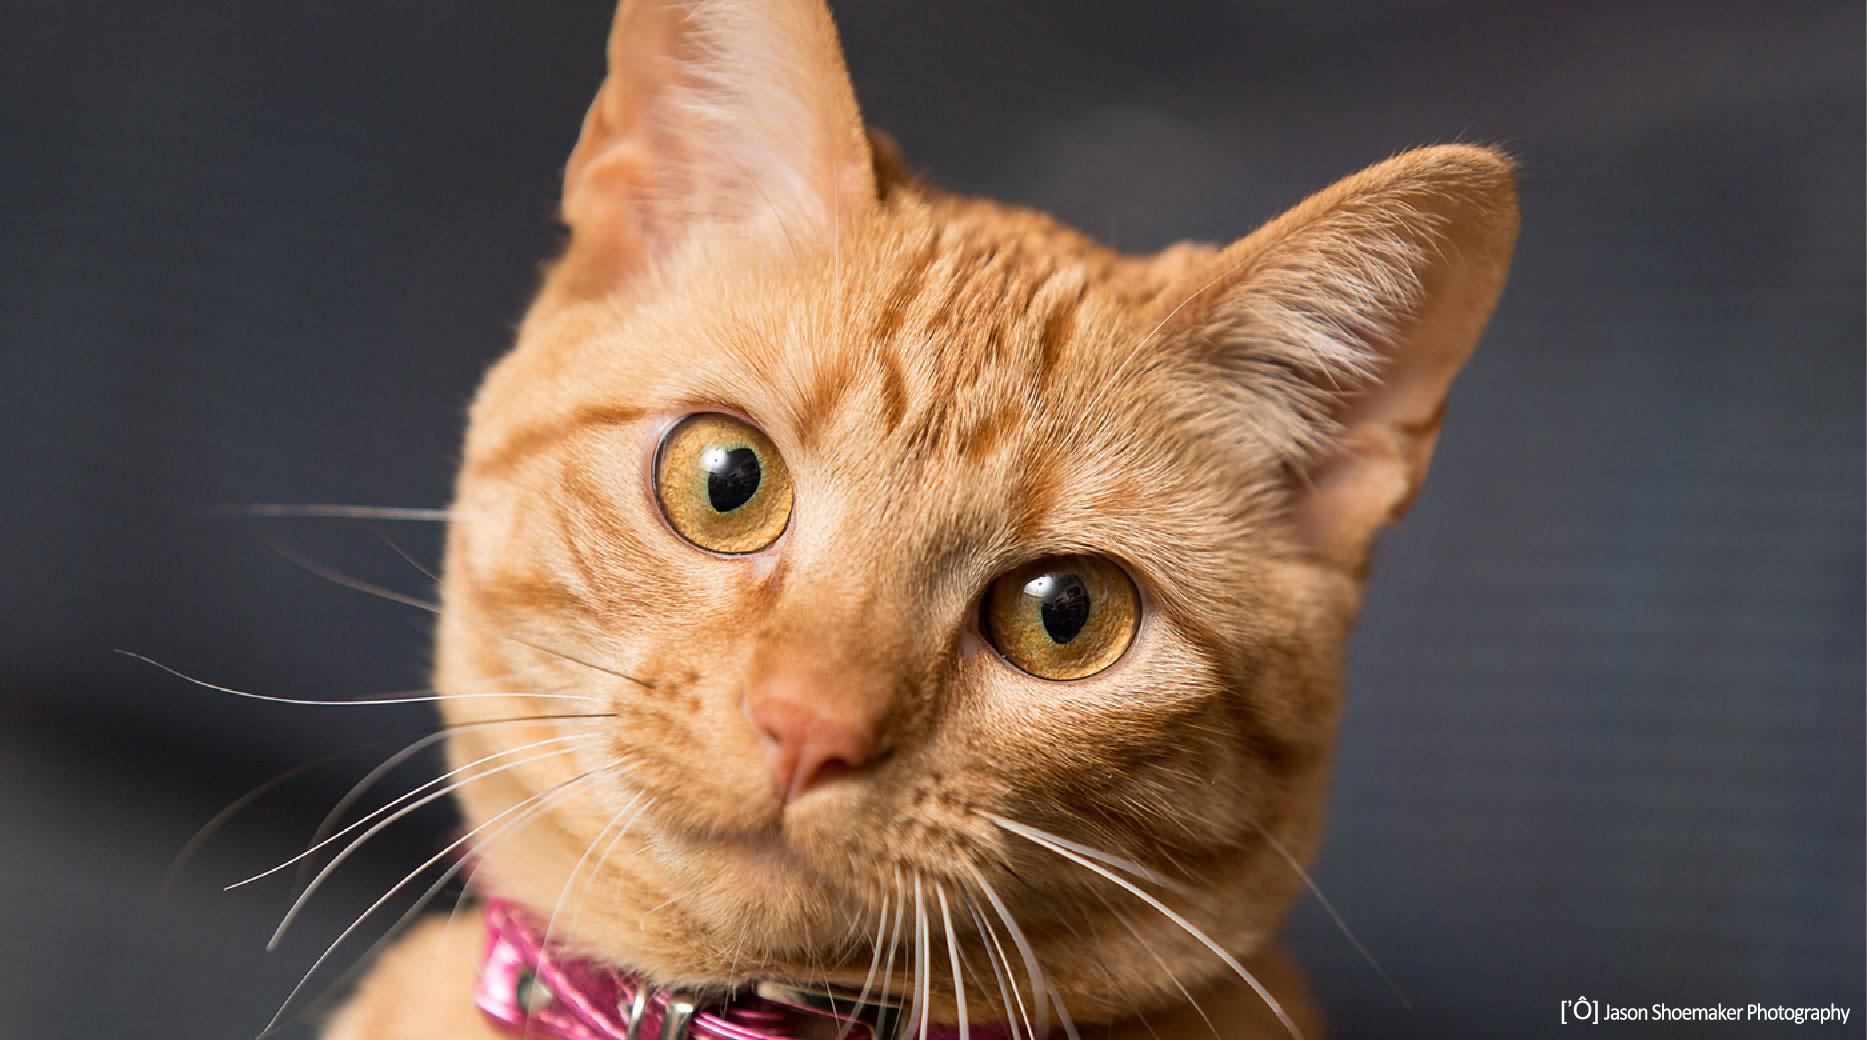 cat tally orange face close-up kansas city pet sitting cat sitting